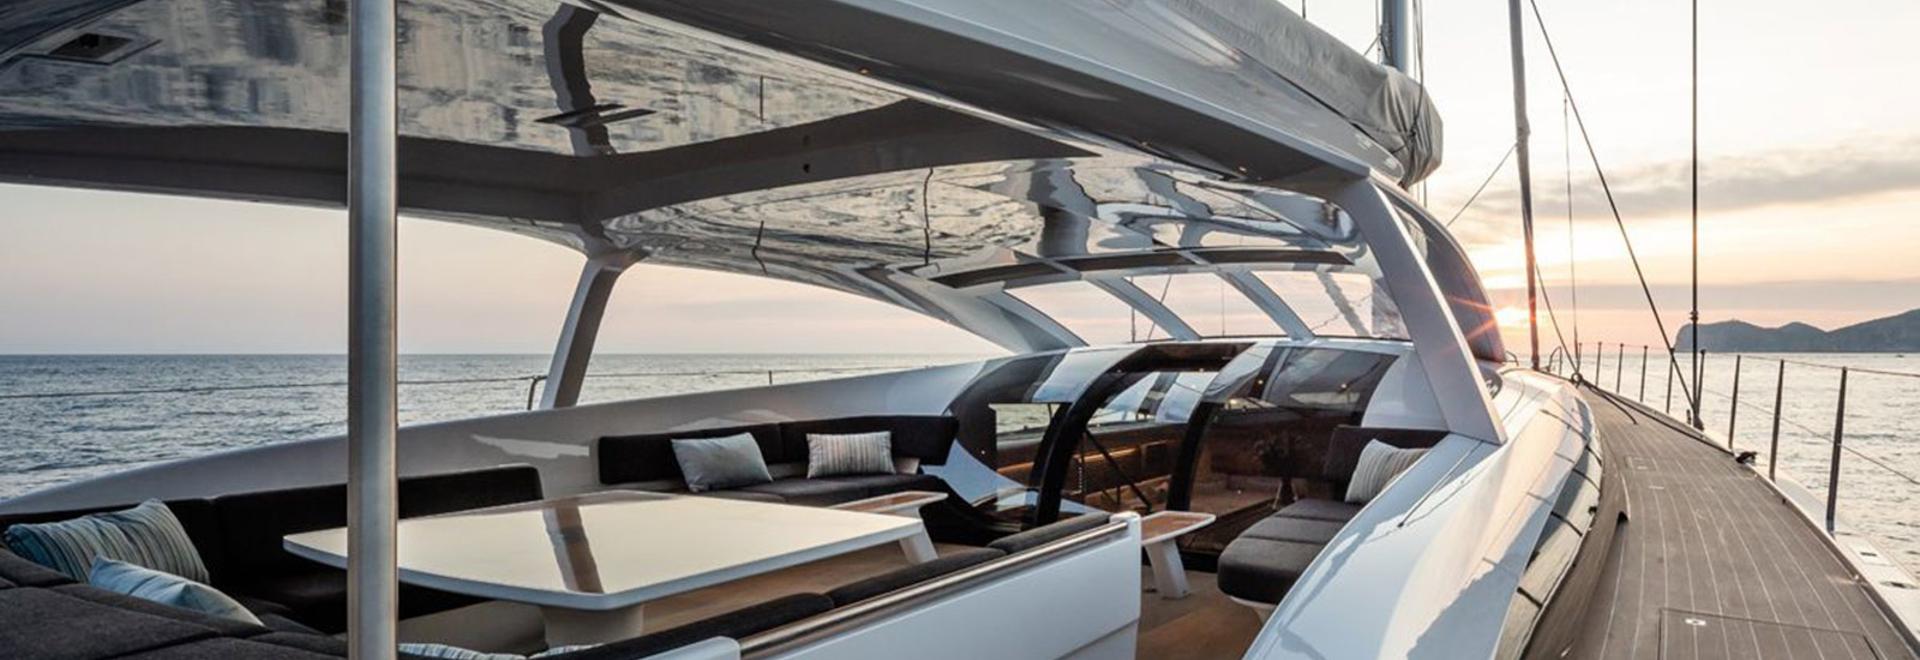 All'interno del Baltico 112 Custom Sailing Yacht a vela Liara